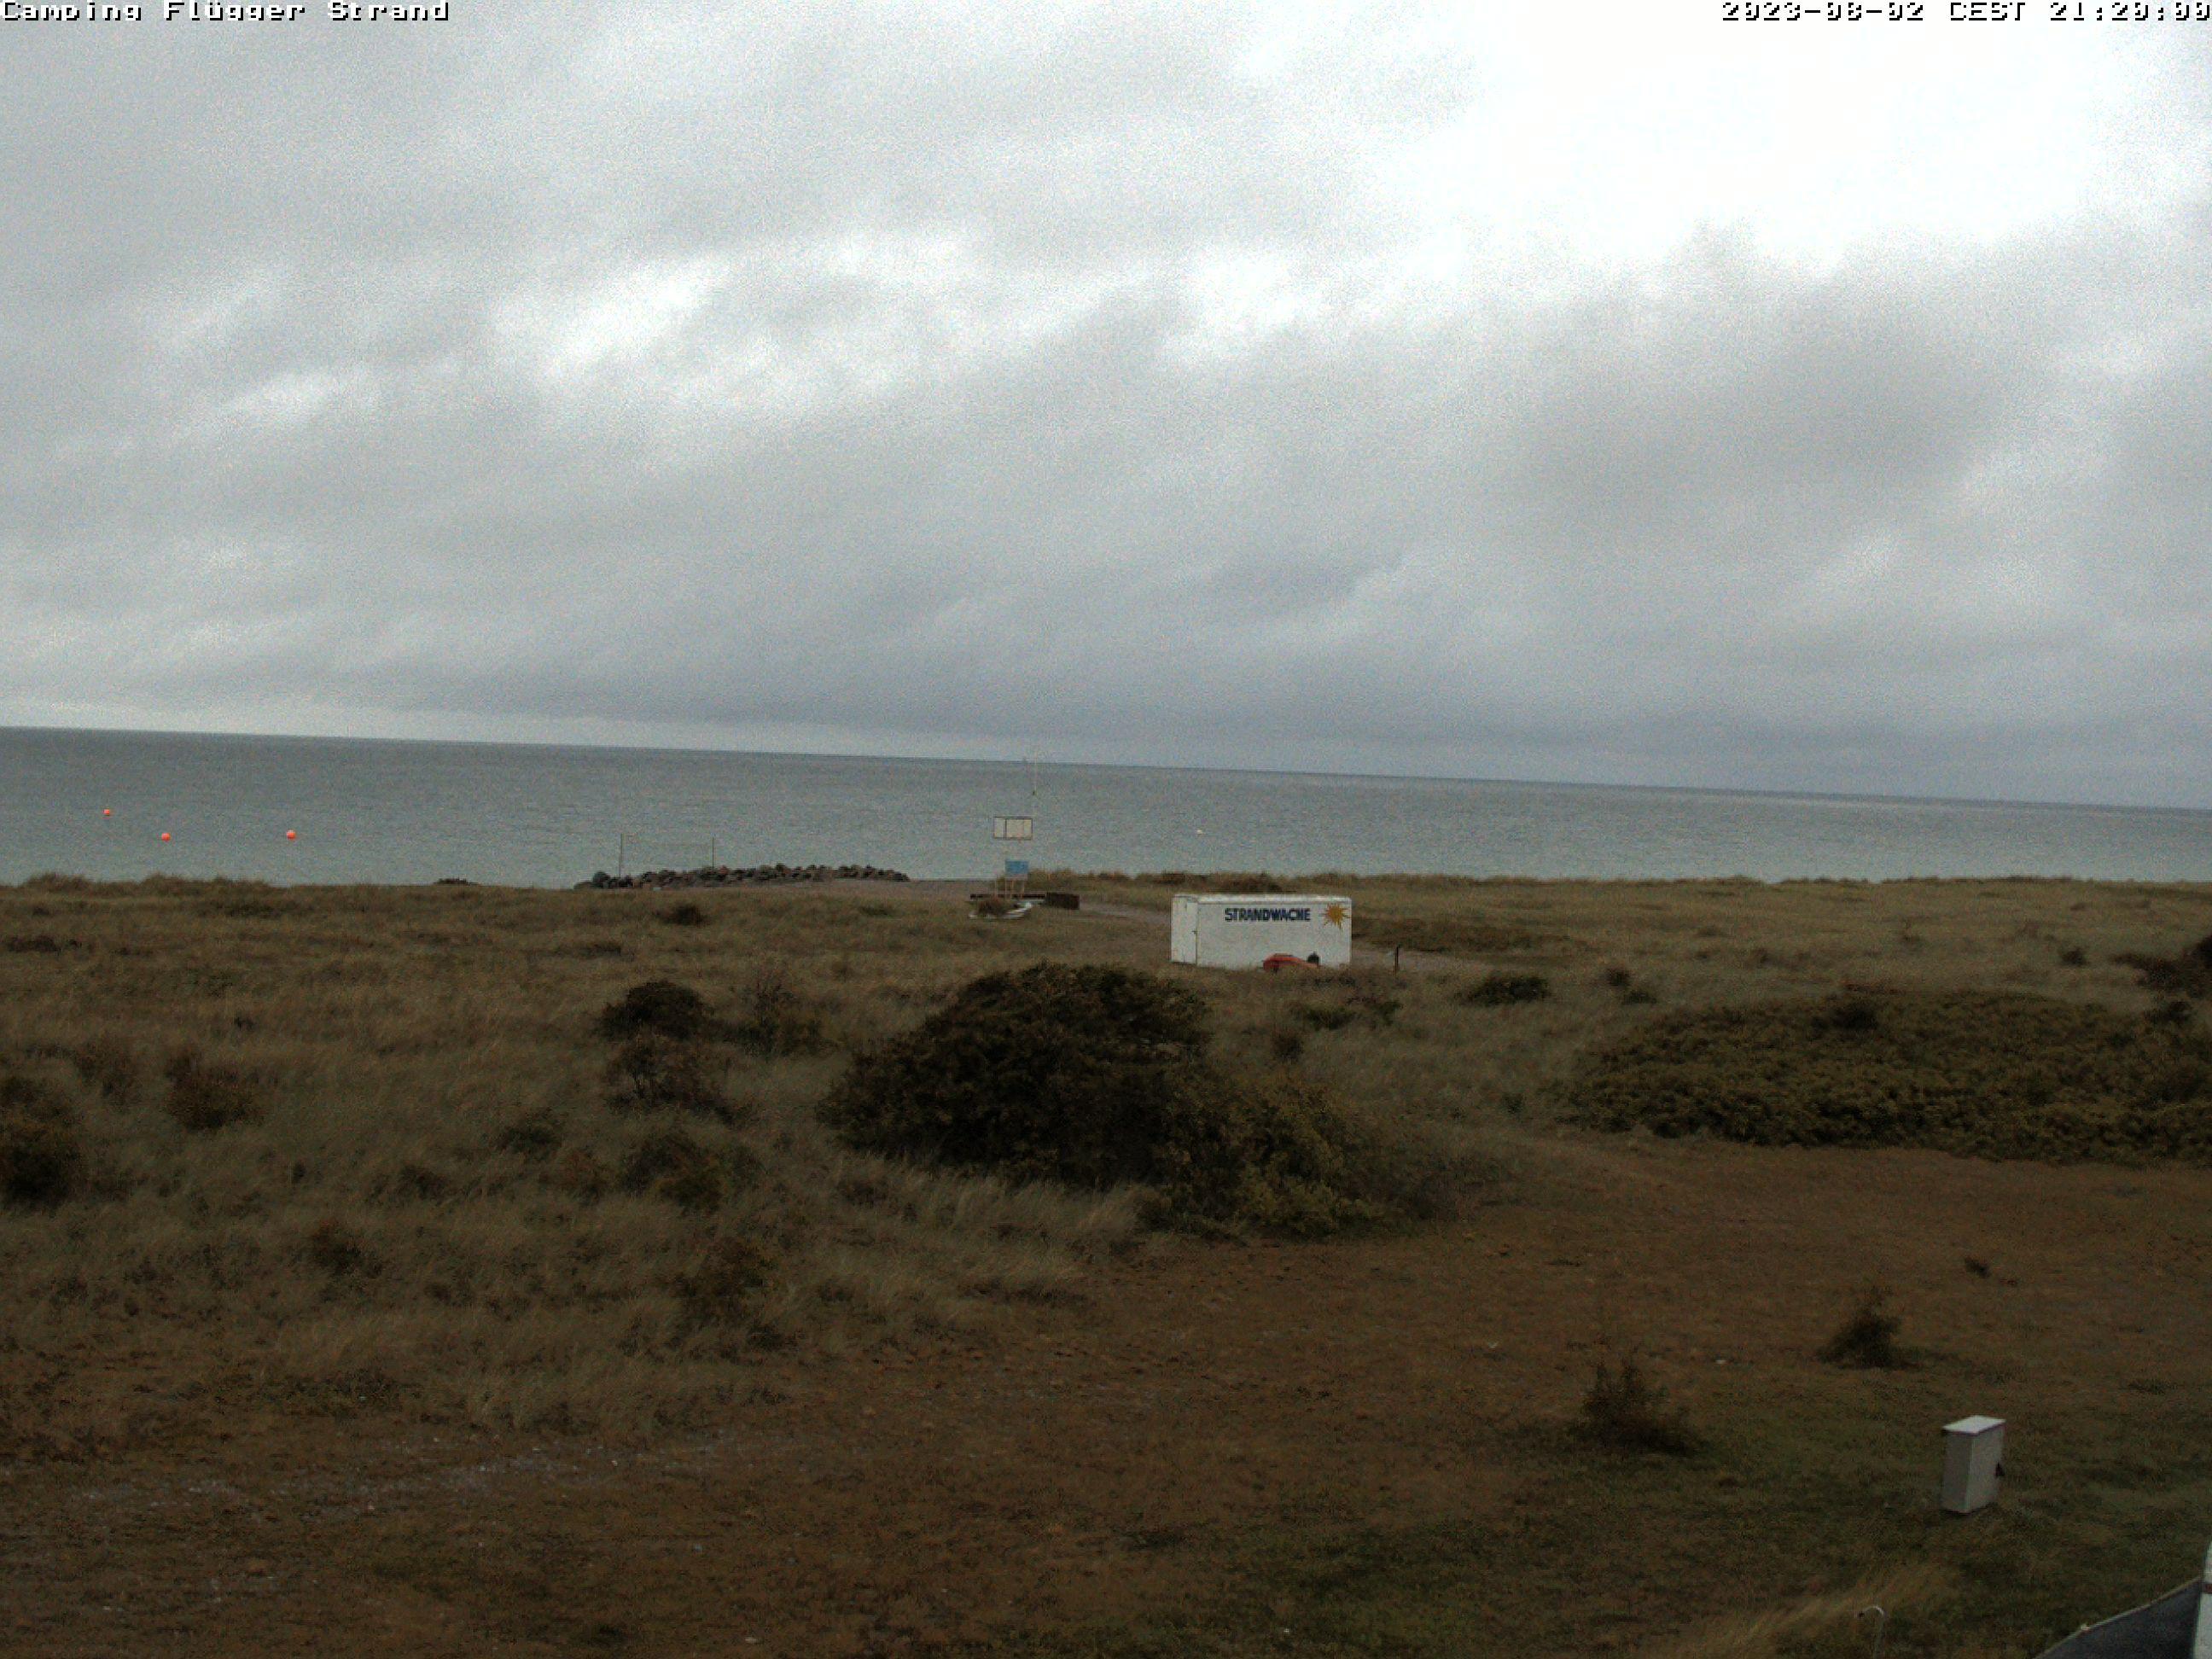 Live-Webcam - Flügger Strand